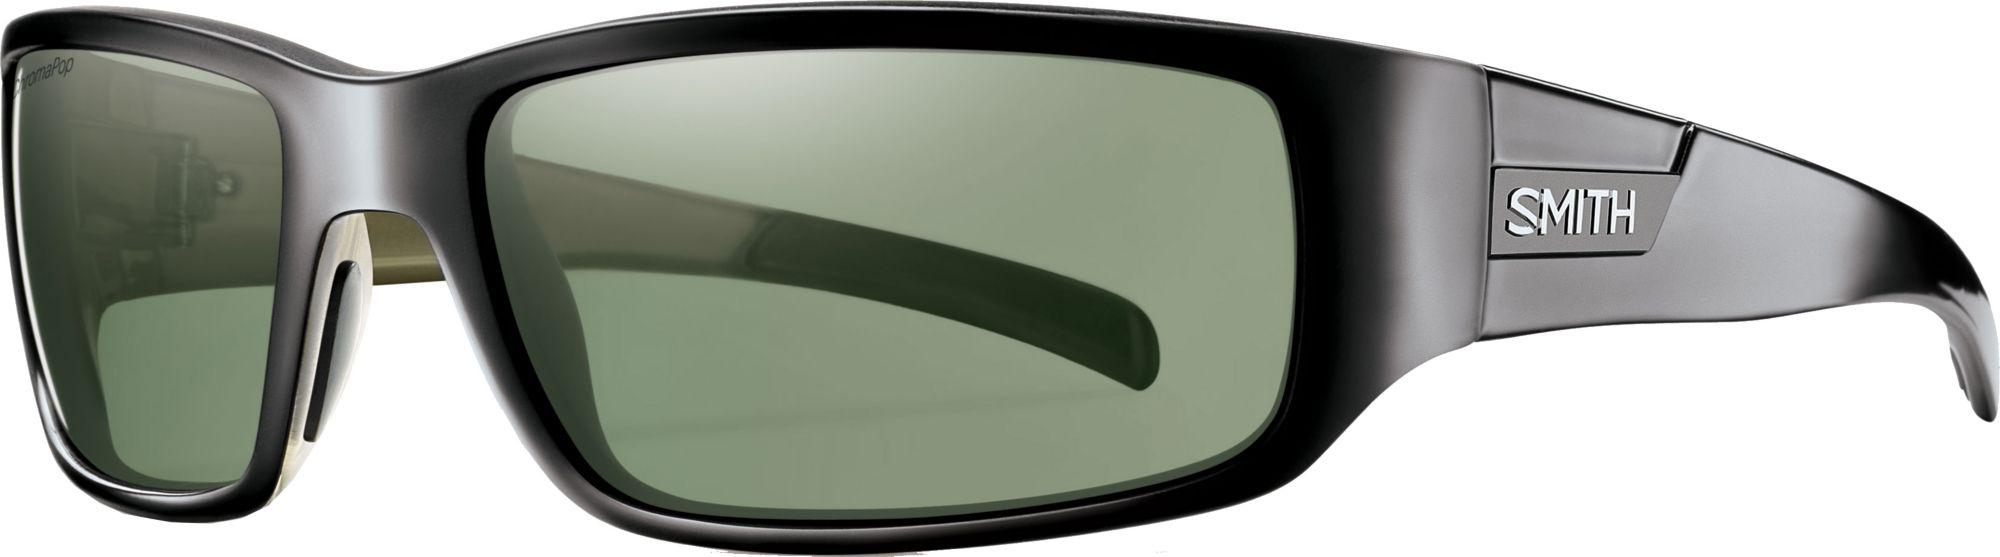 725aaf99c9 Lyst - Smith Optics Prospect Polarized Sunglasses in Green